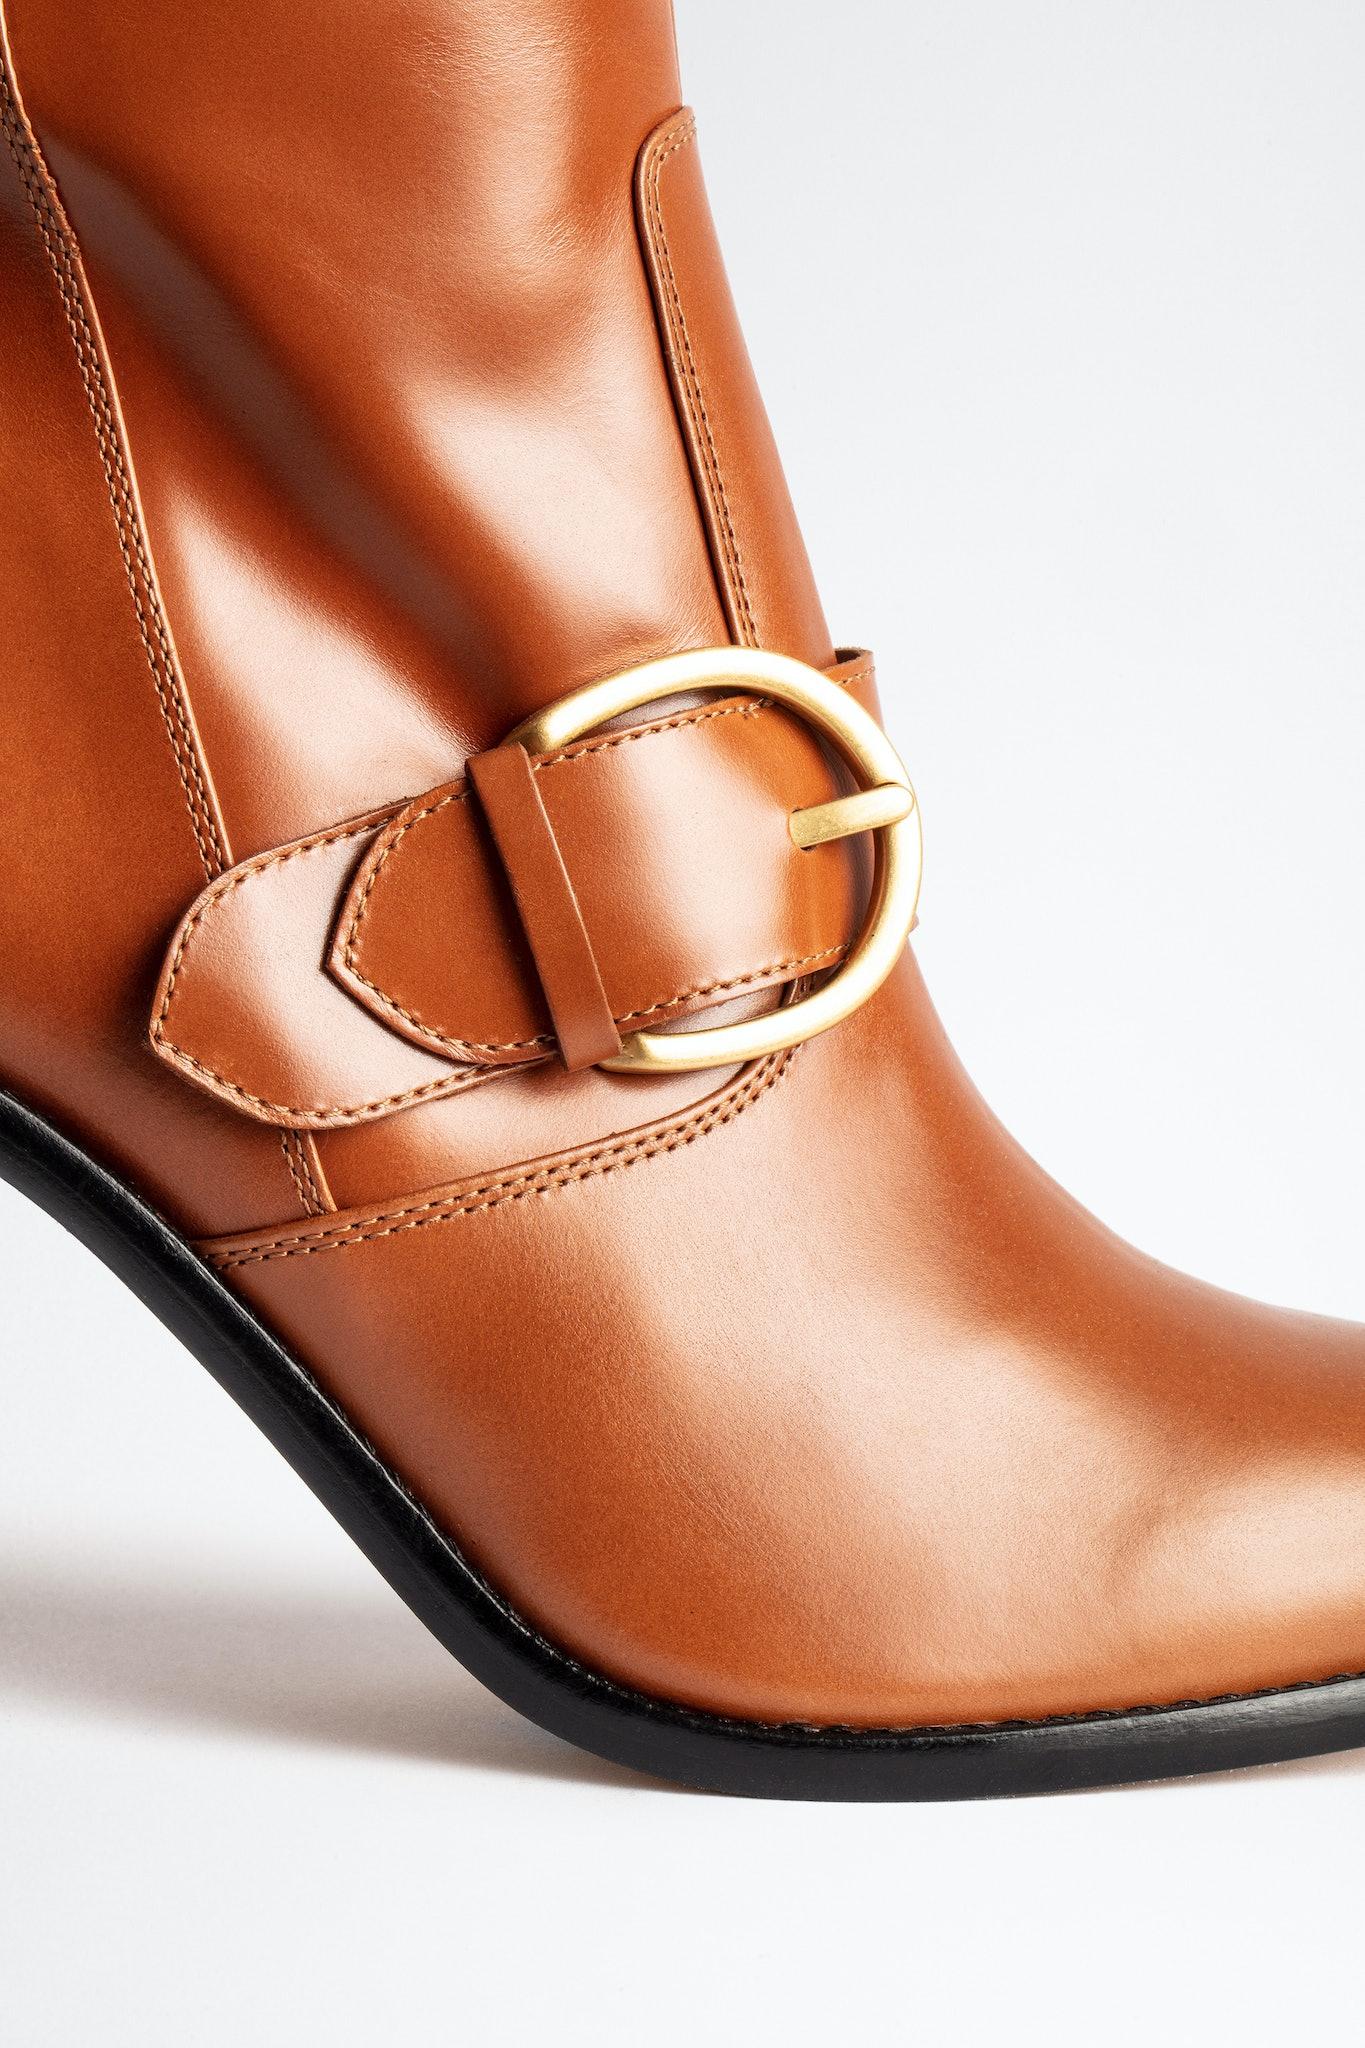 Preiser Buckle Vintage Boots